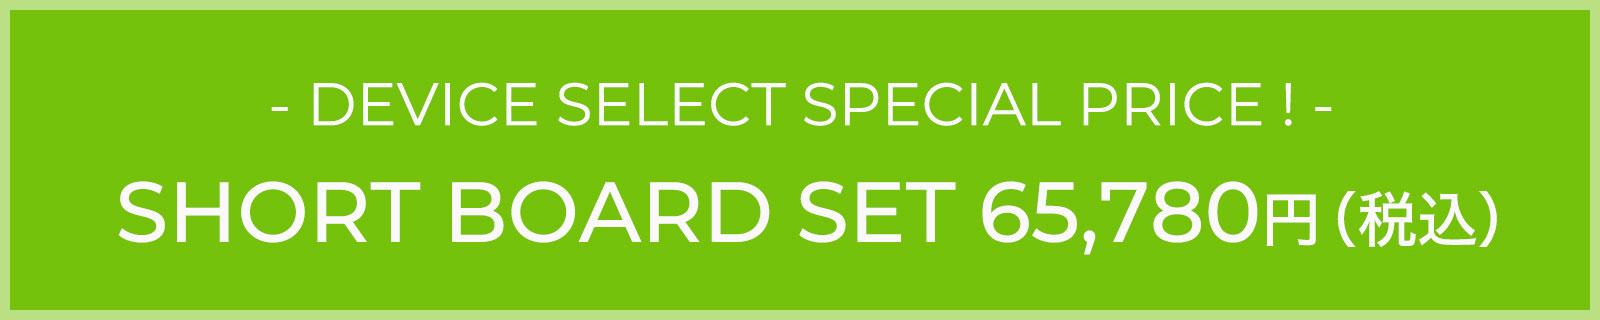 Shortboard set